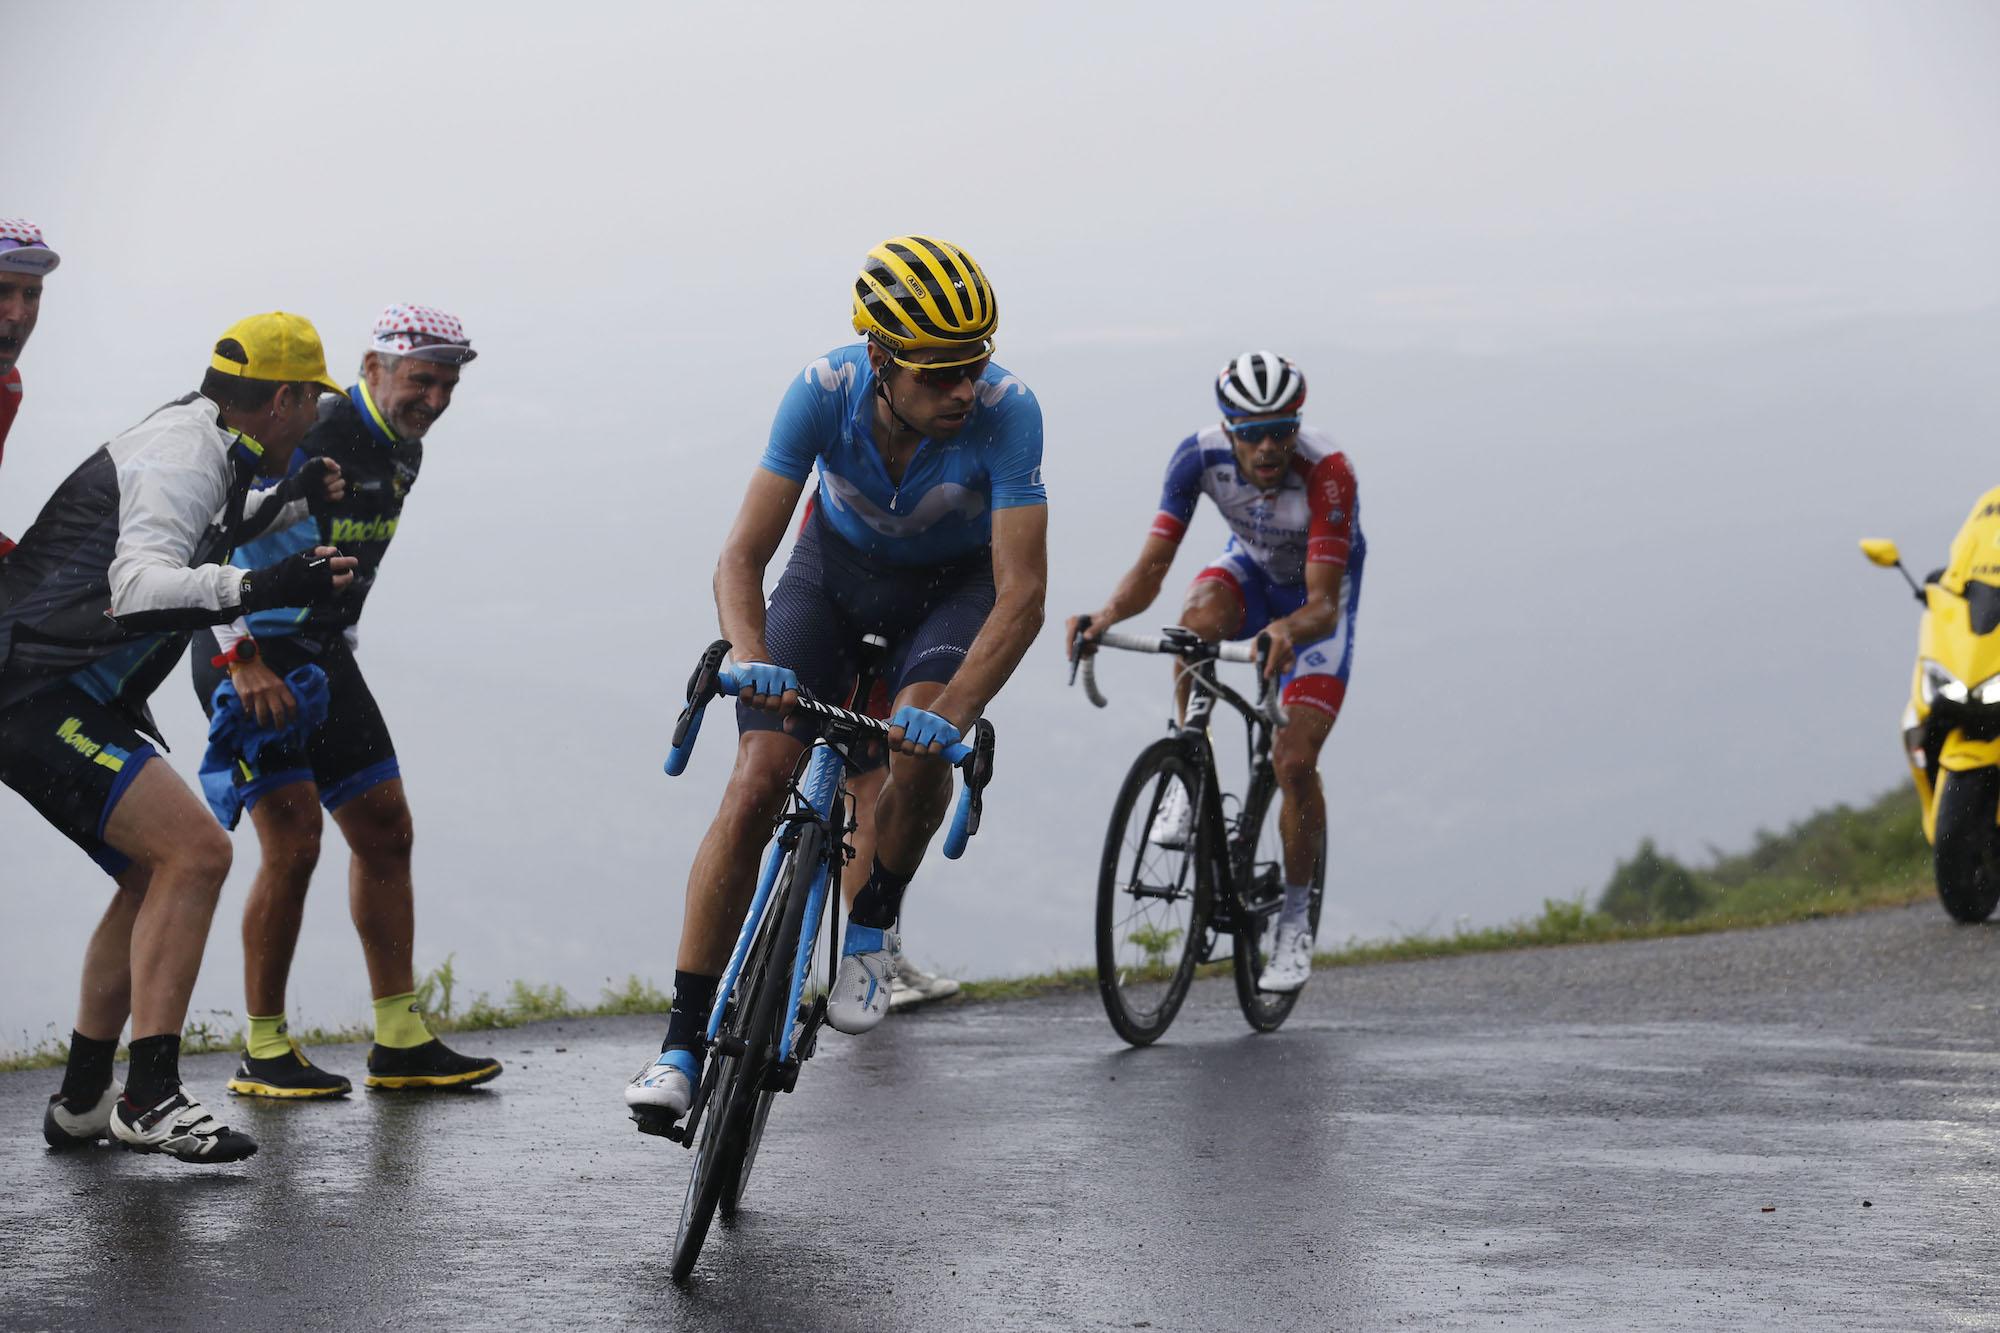 Tour De France 2020 Stage 15 Movistar boss confirms departure of Carapaz & Quintana but says